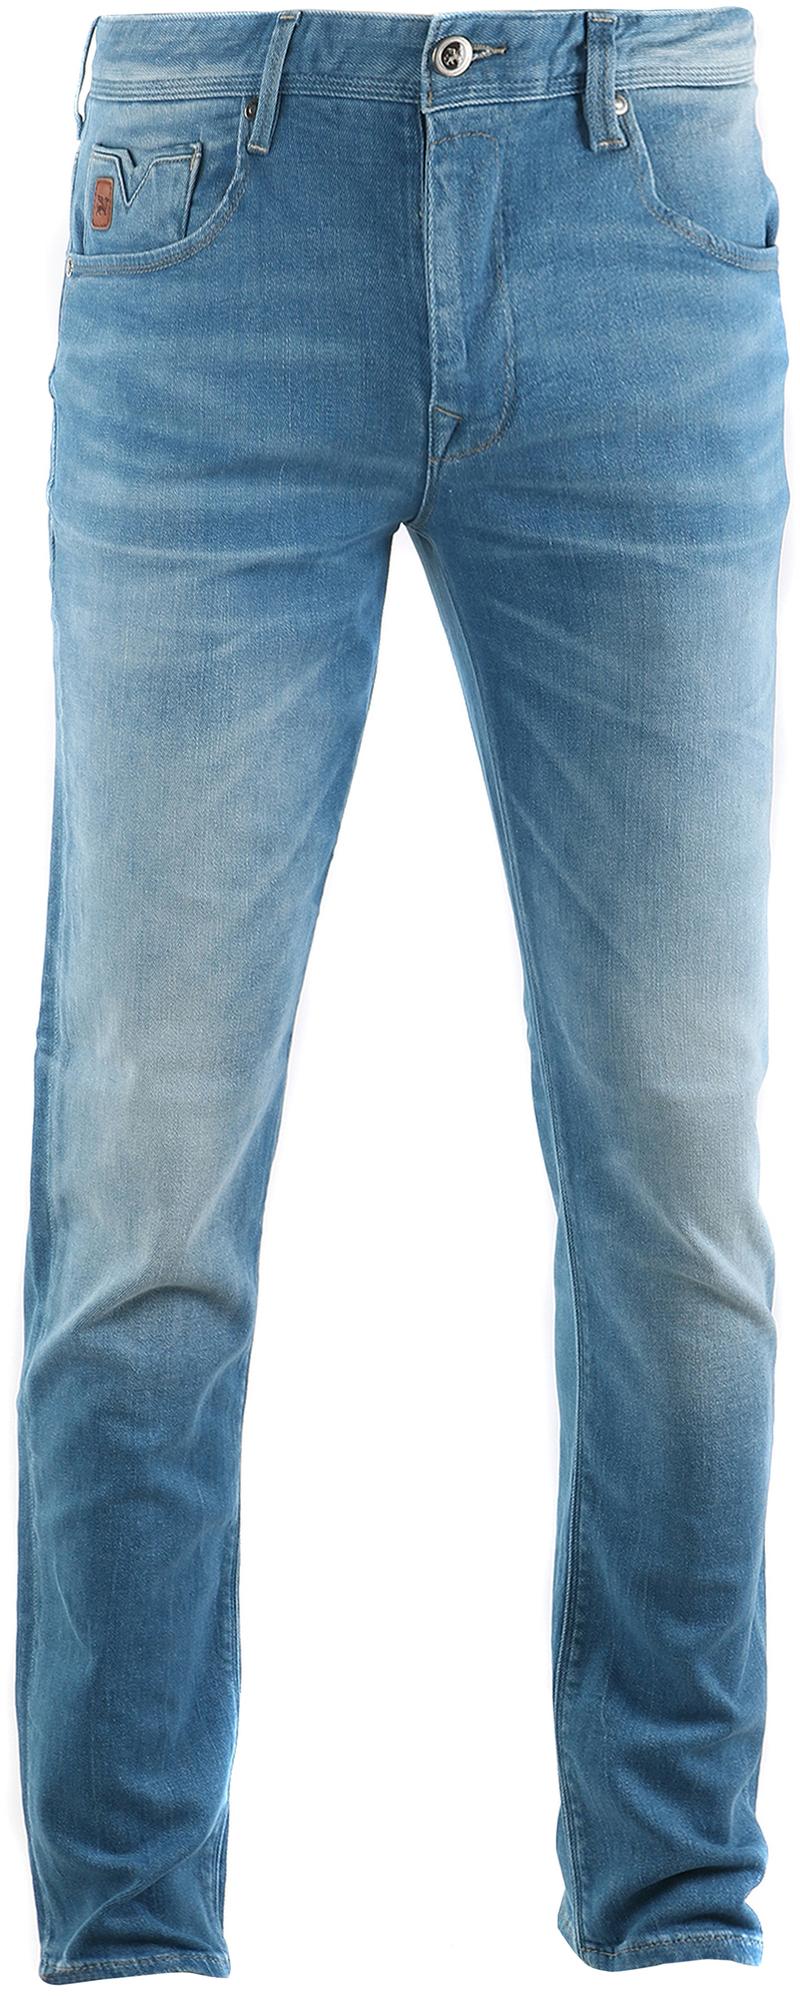 Vanguard V7 Rider Jeans Clear Blue foto 0